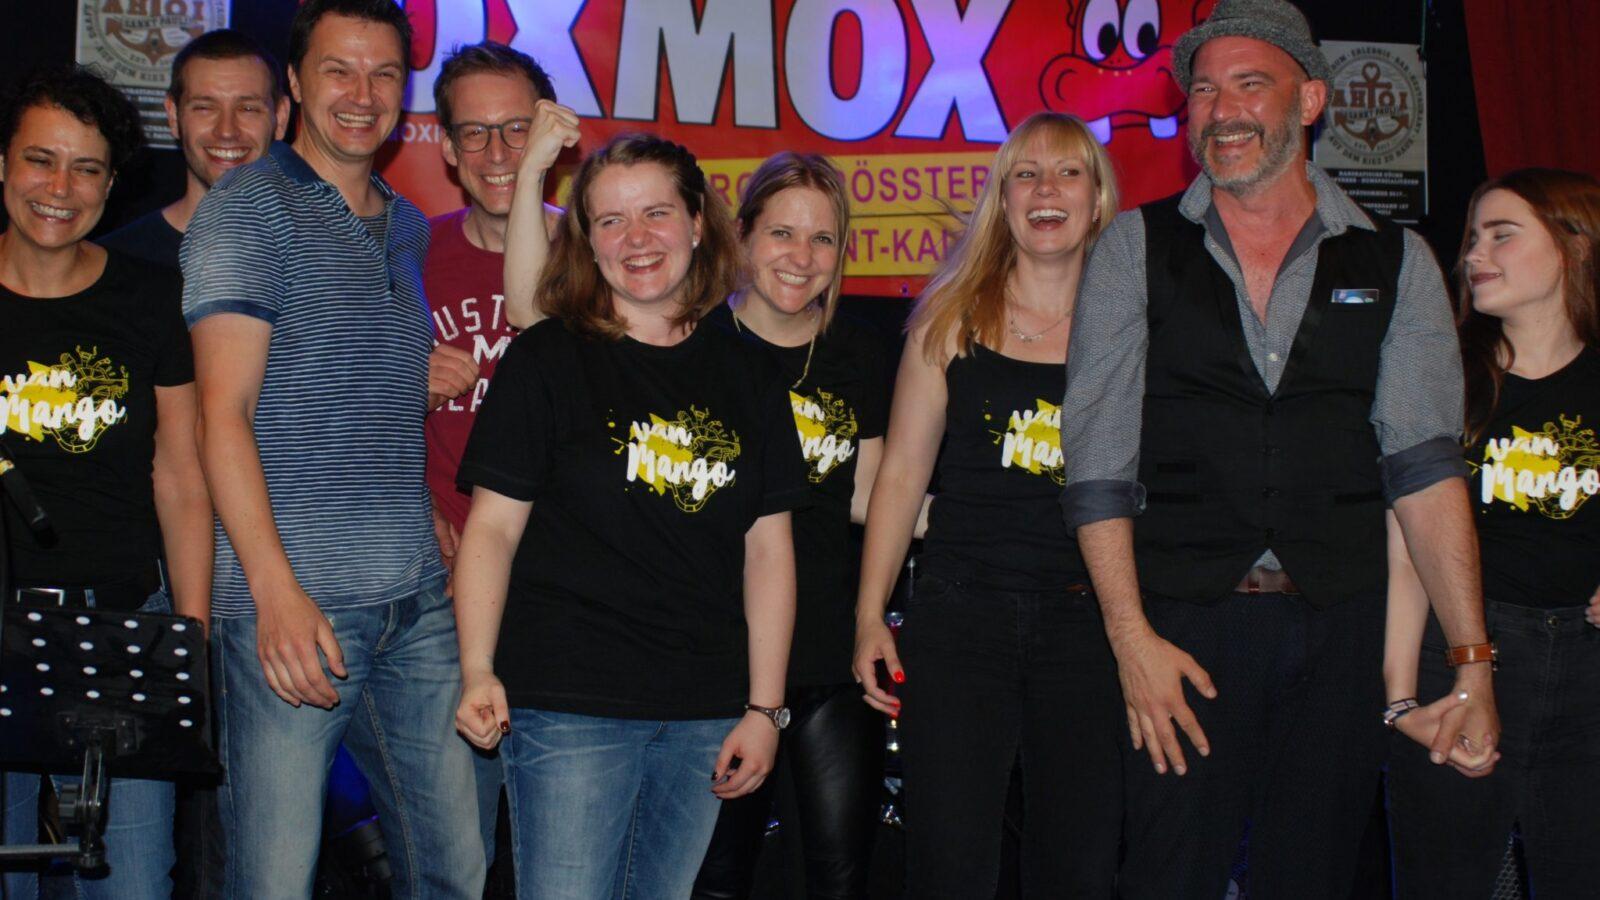 OXMOX PRESENTS: EXKL. FOTOS DES 32. HAMBURG-BANDCONTEST HALBFINALES (06.07.17)